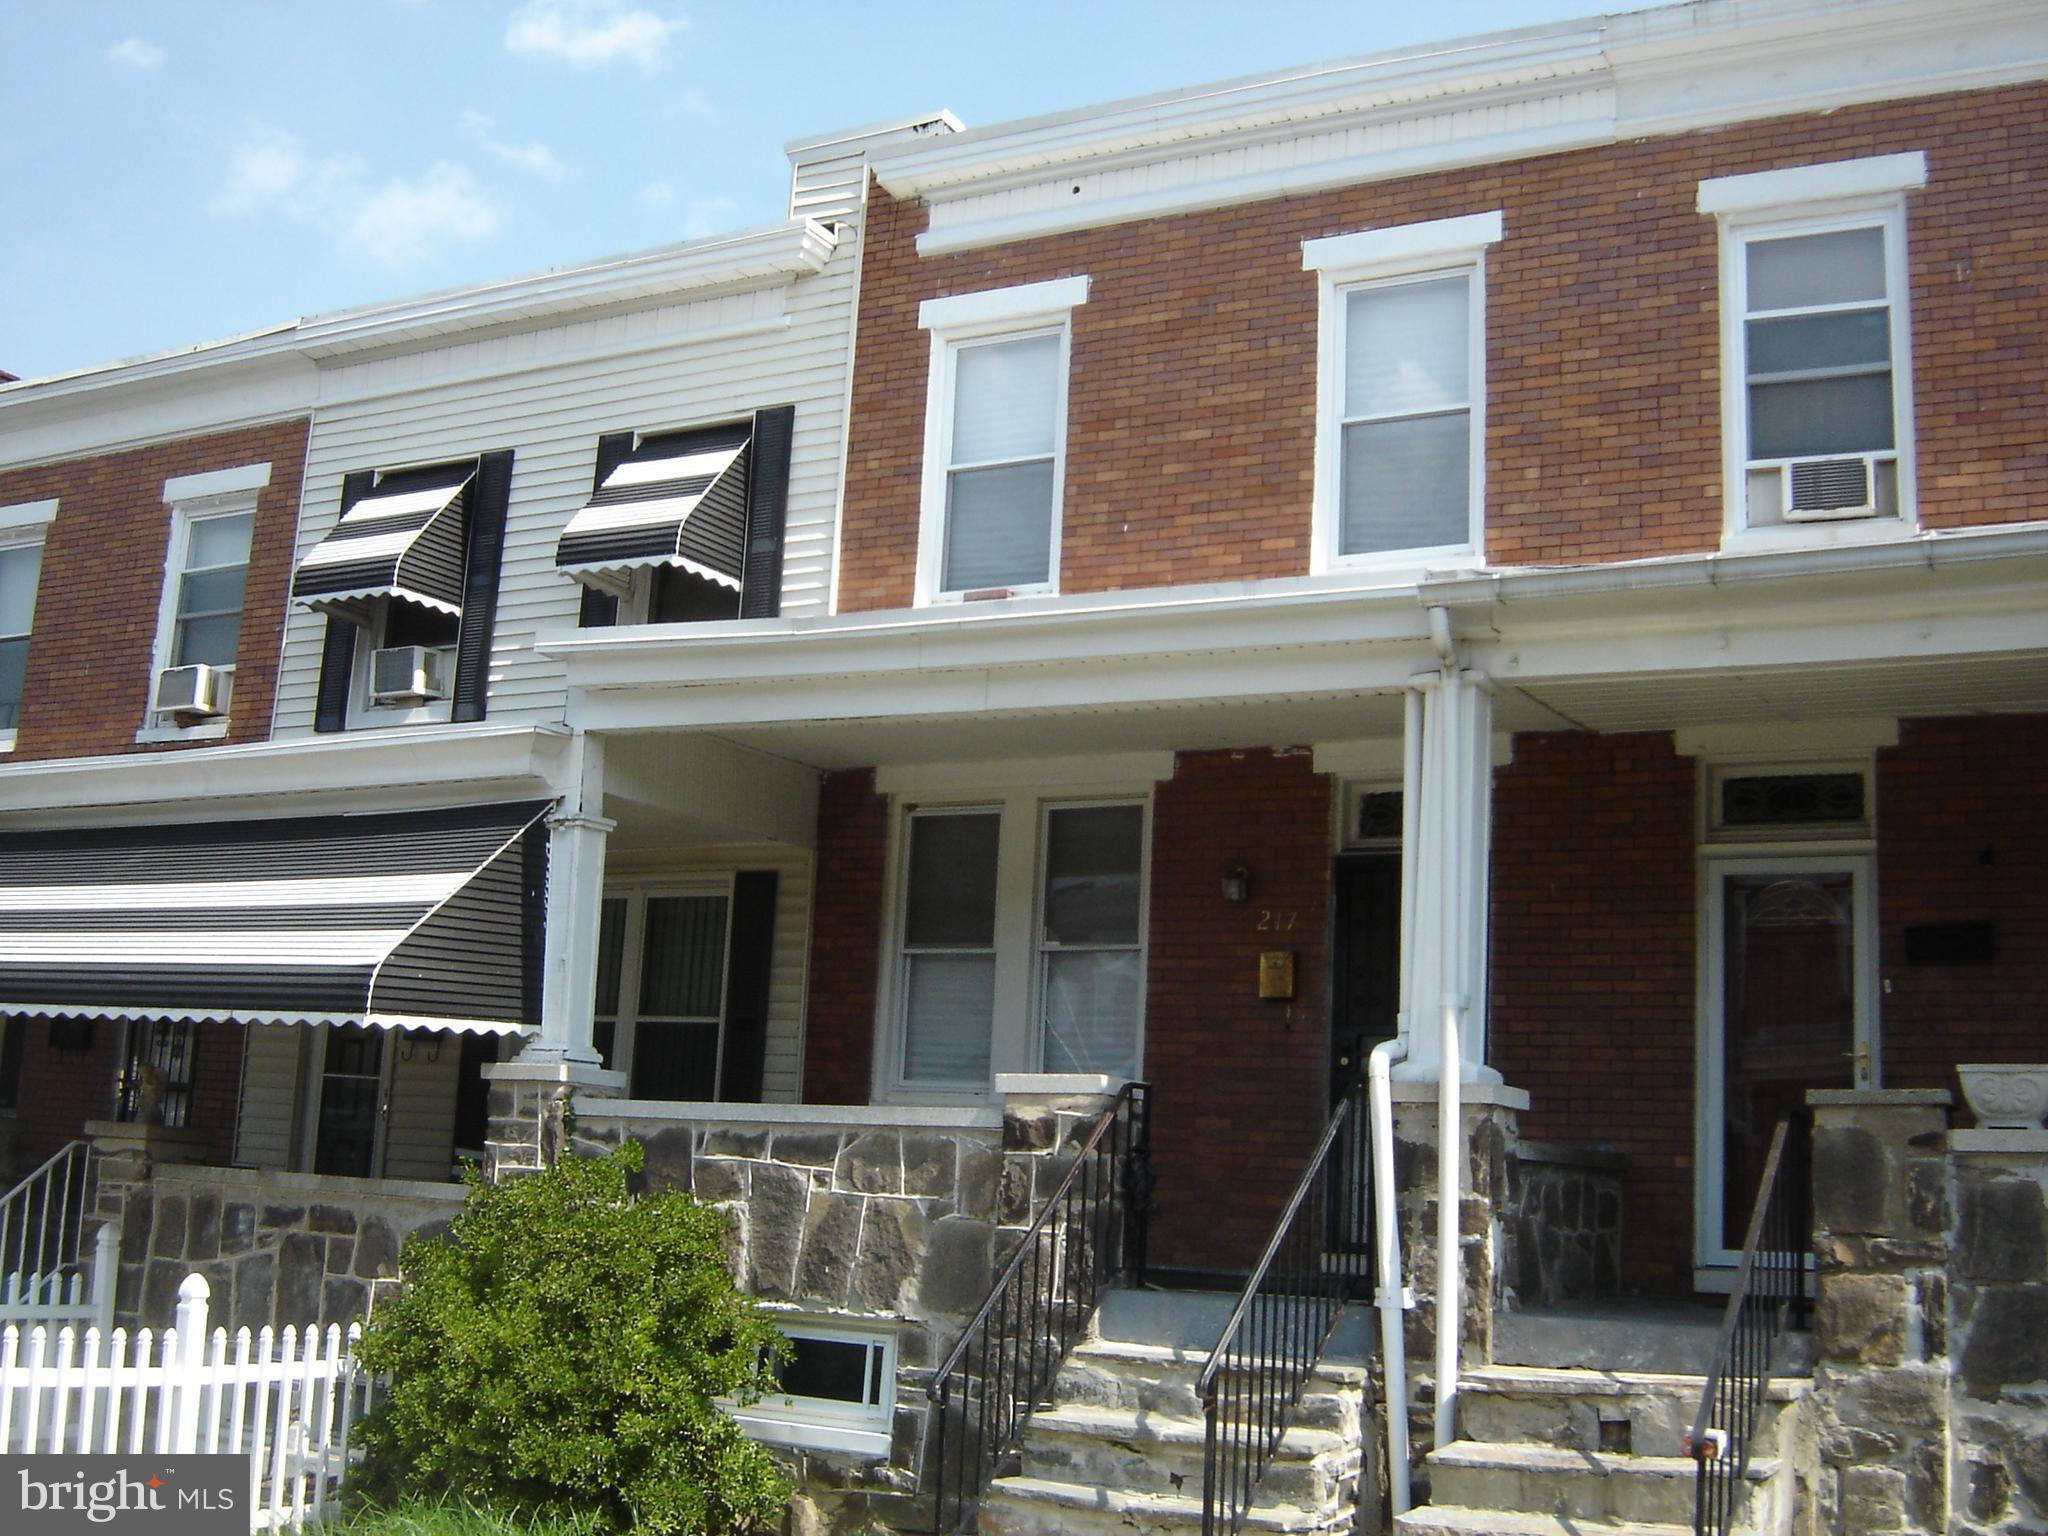 217 N. MONASTERY AVENUE, Baltimore, MD 21229